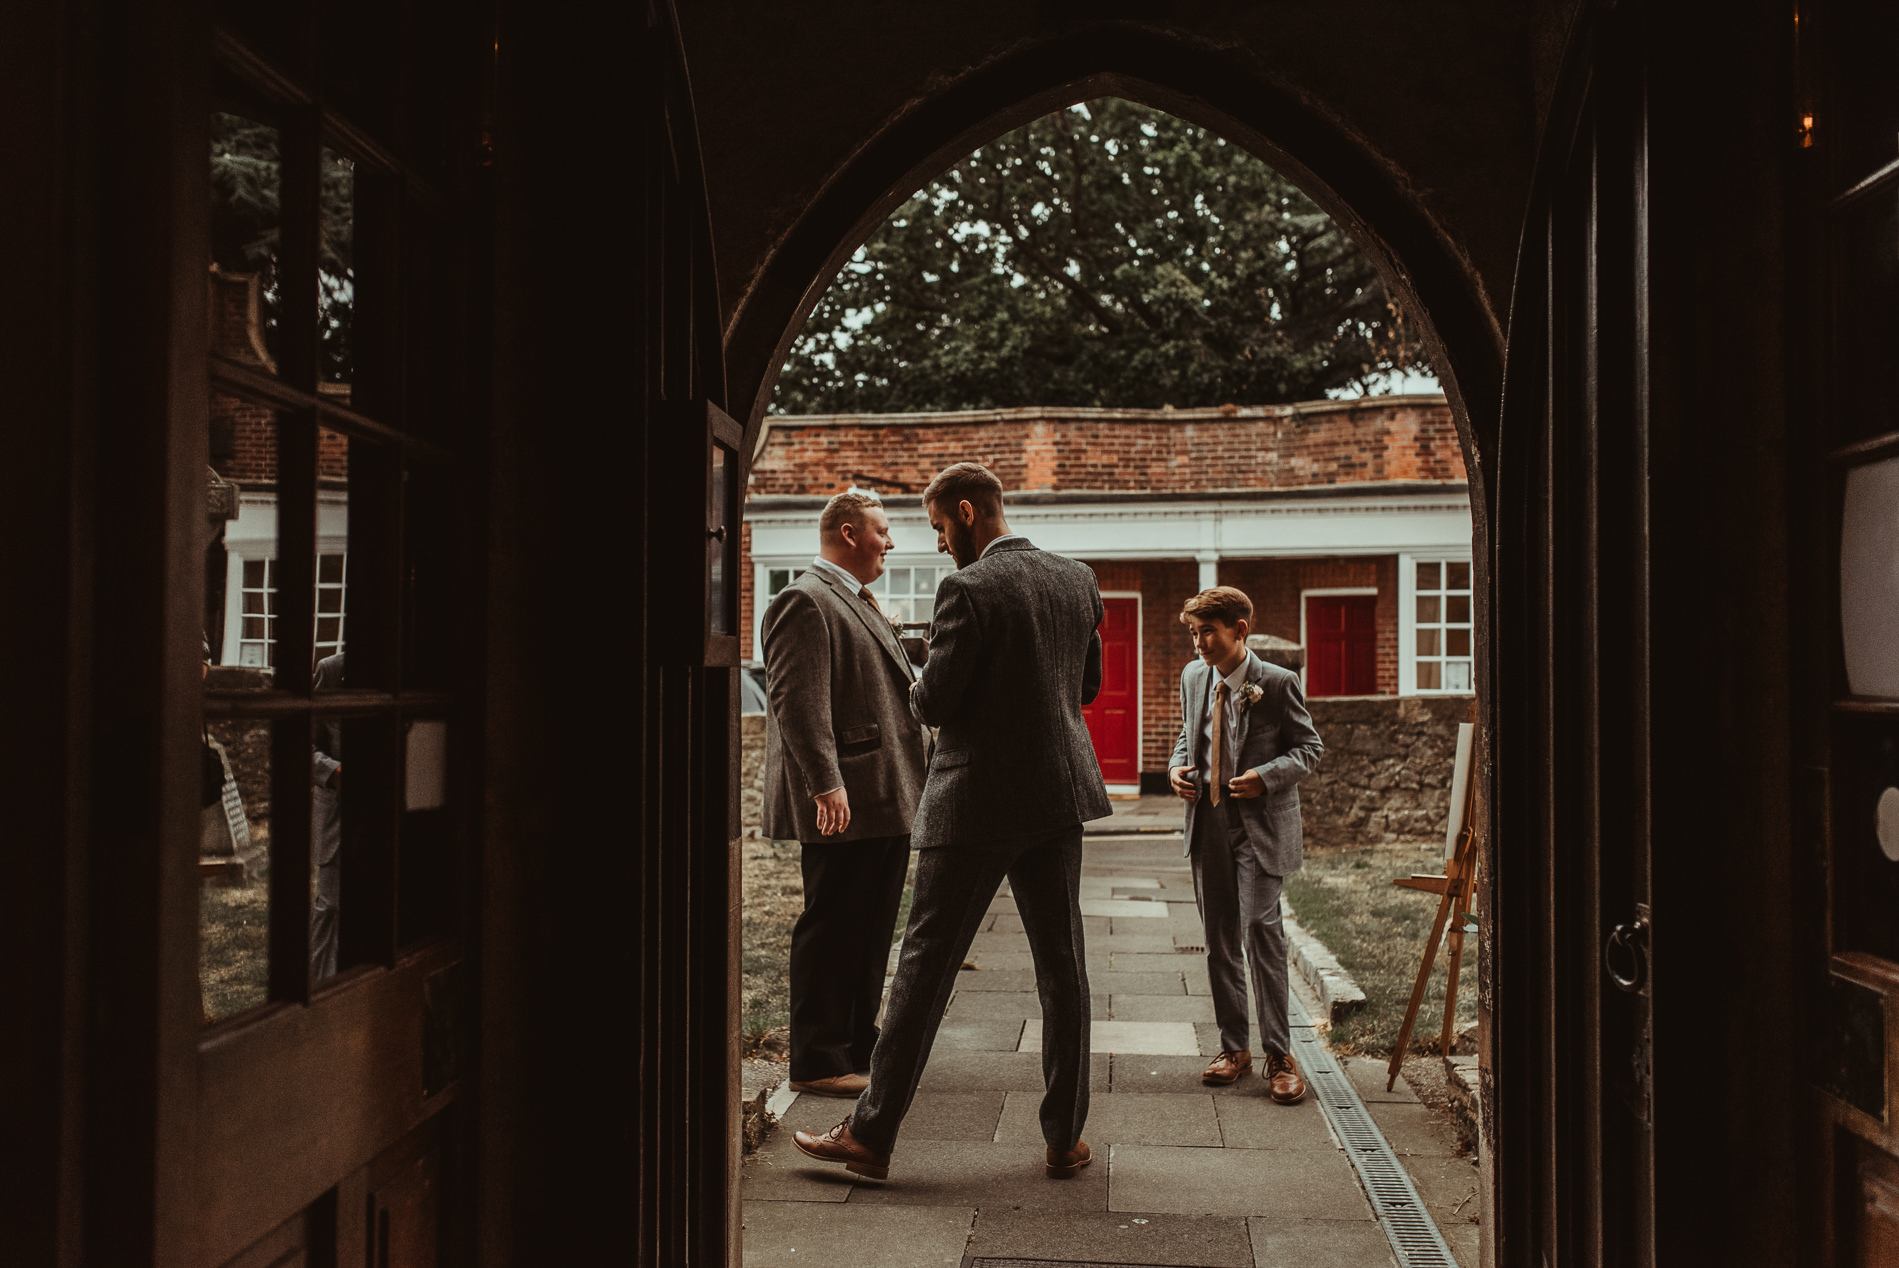 red_brick_barn_weddings_leigh_on-_sea_church-27